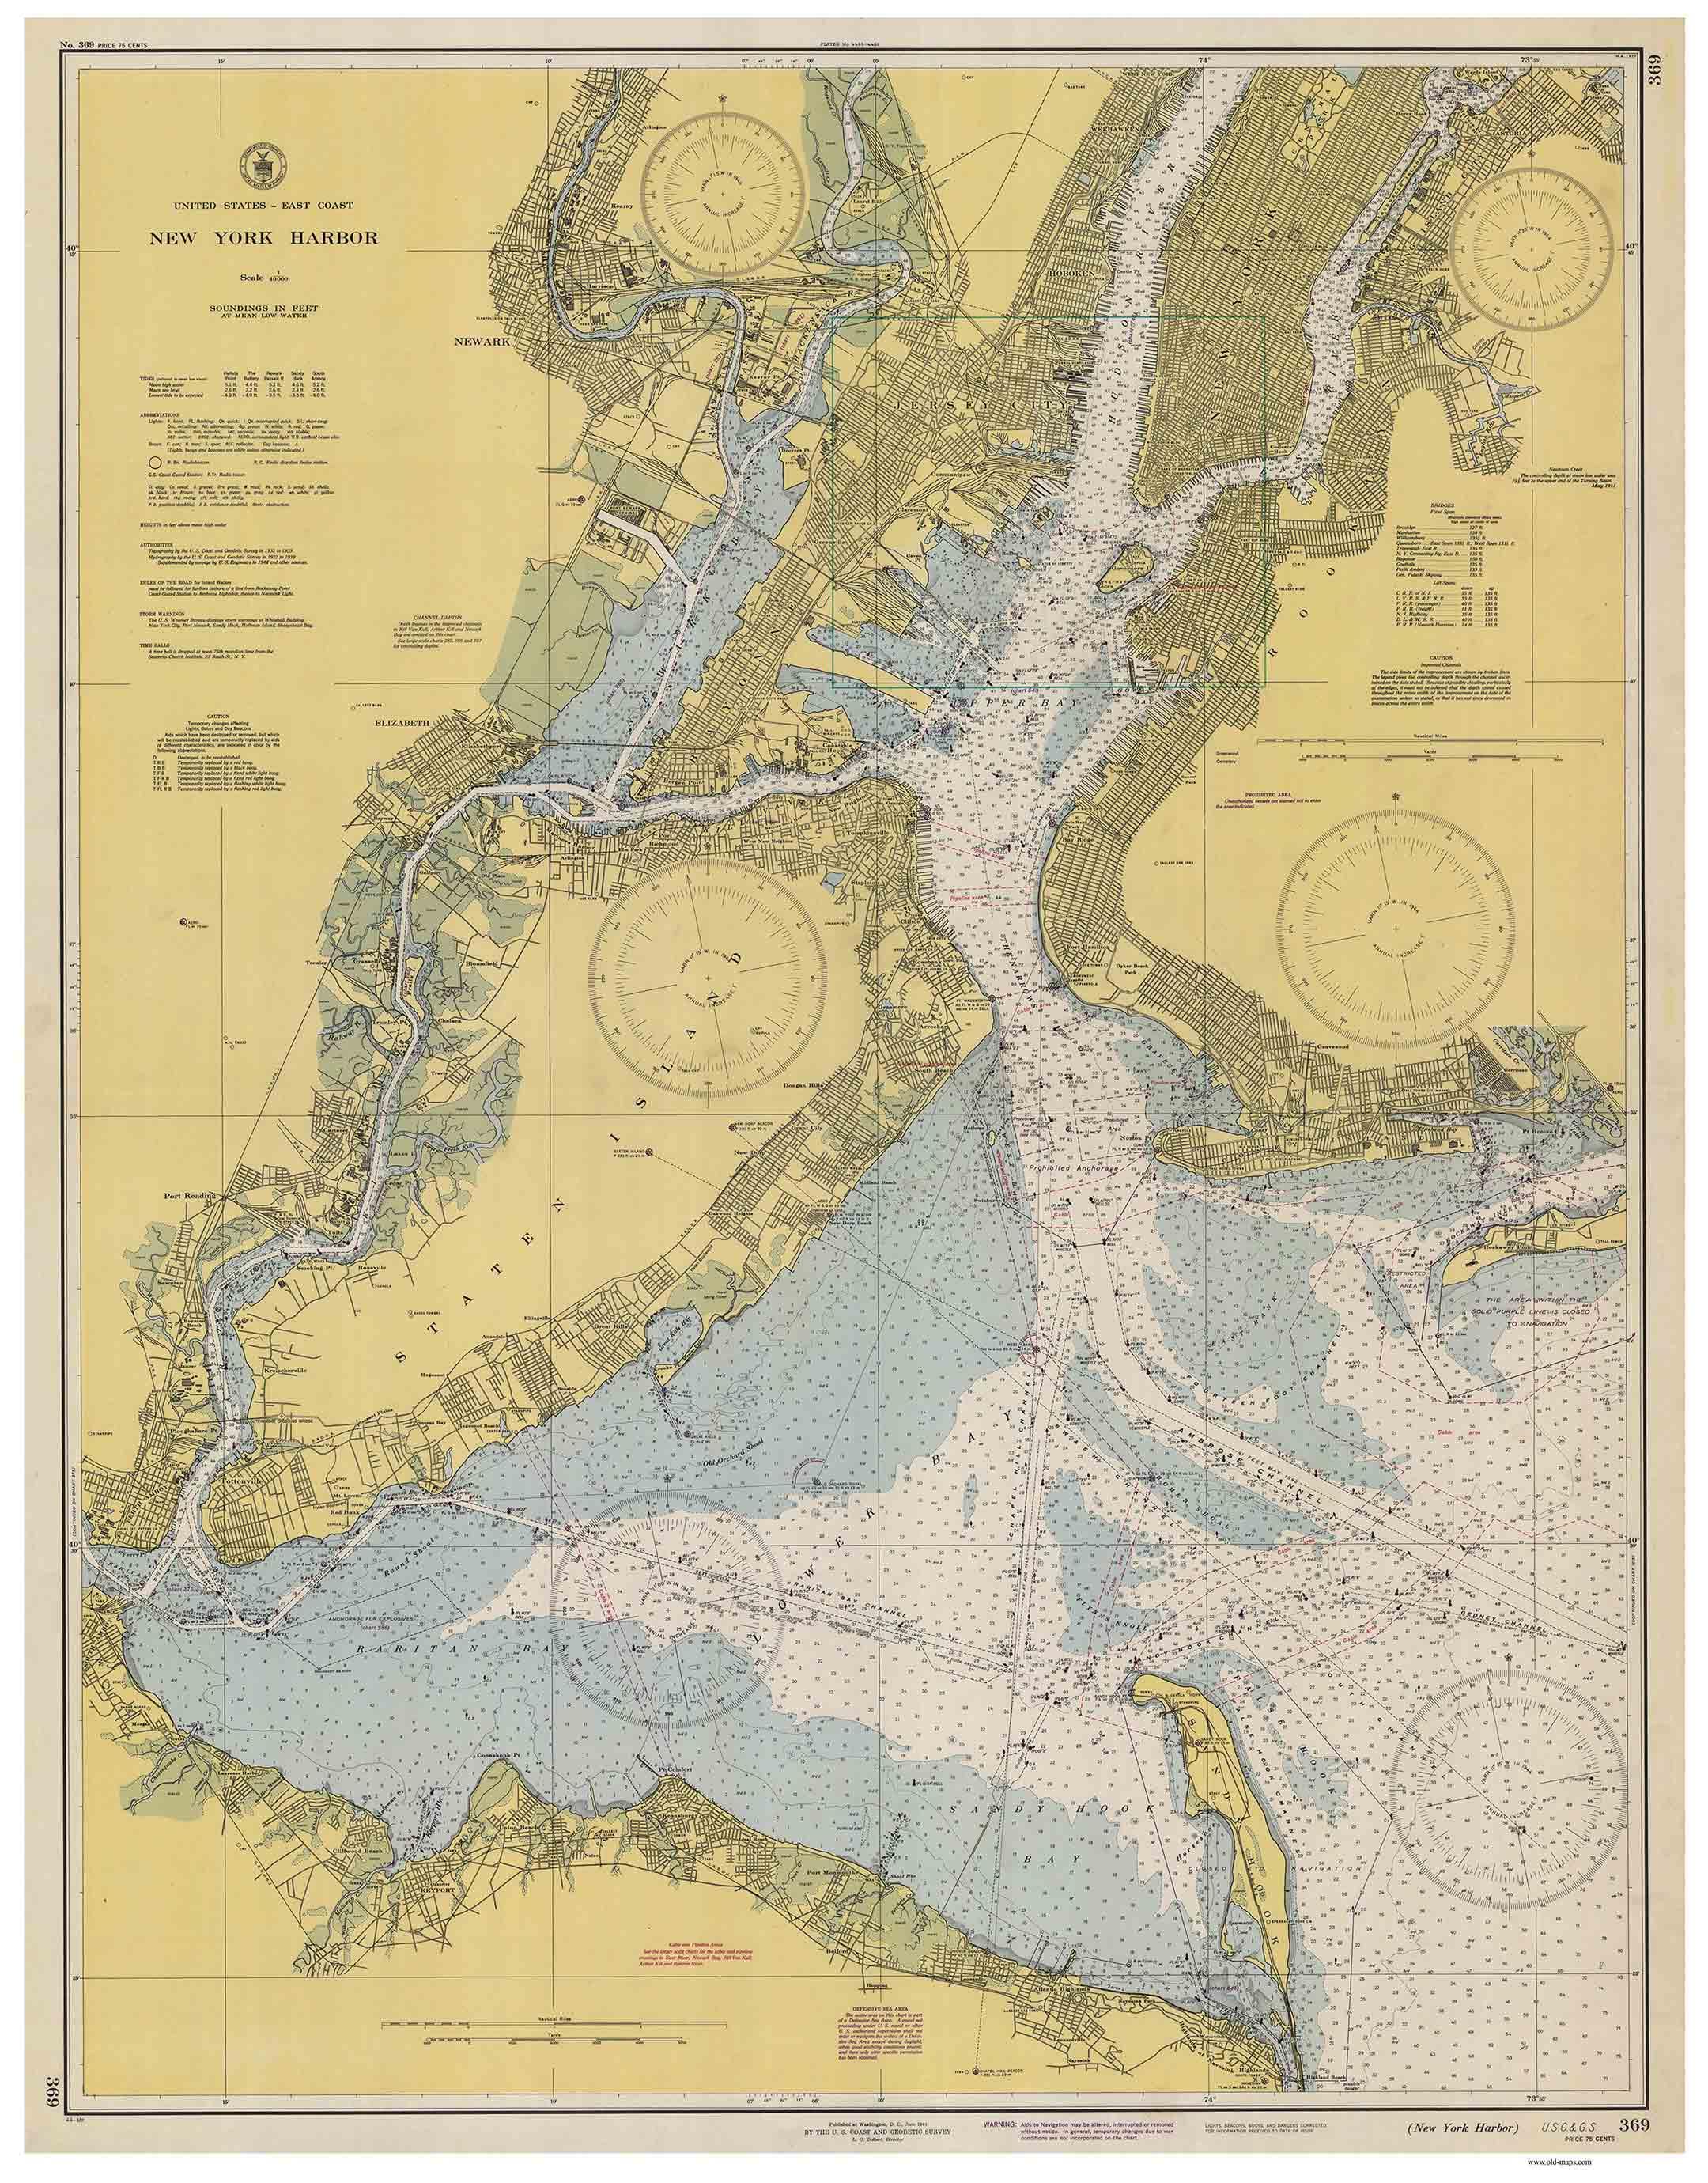 New York Historical Nautical Charts